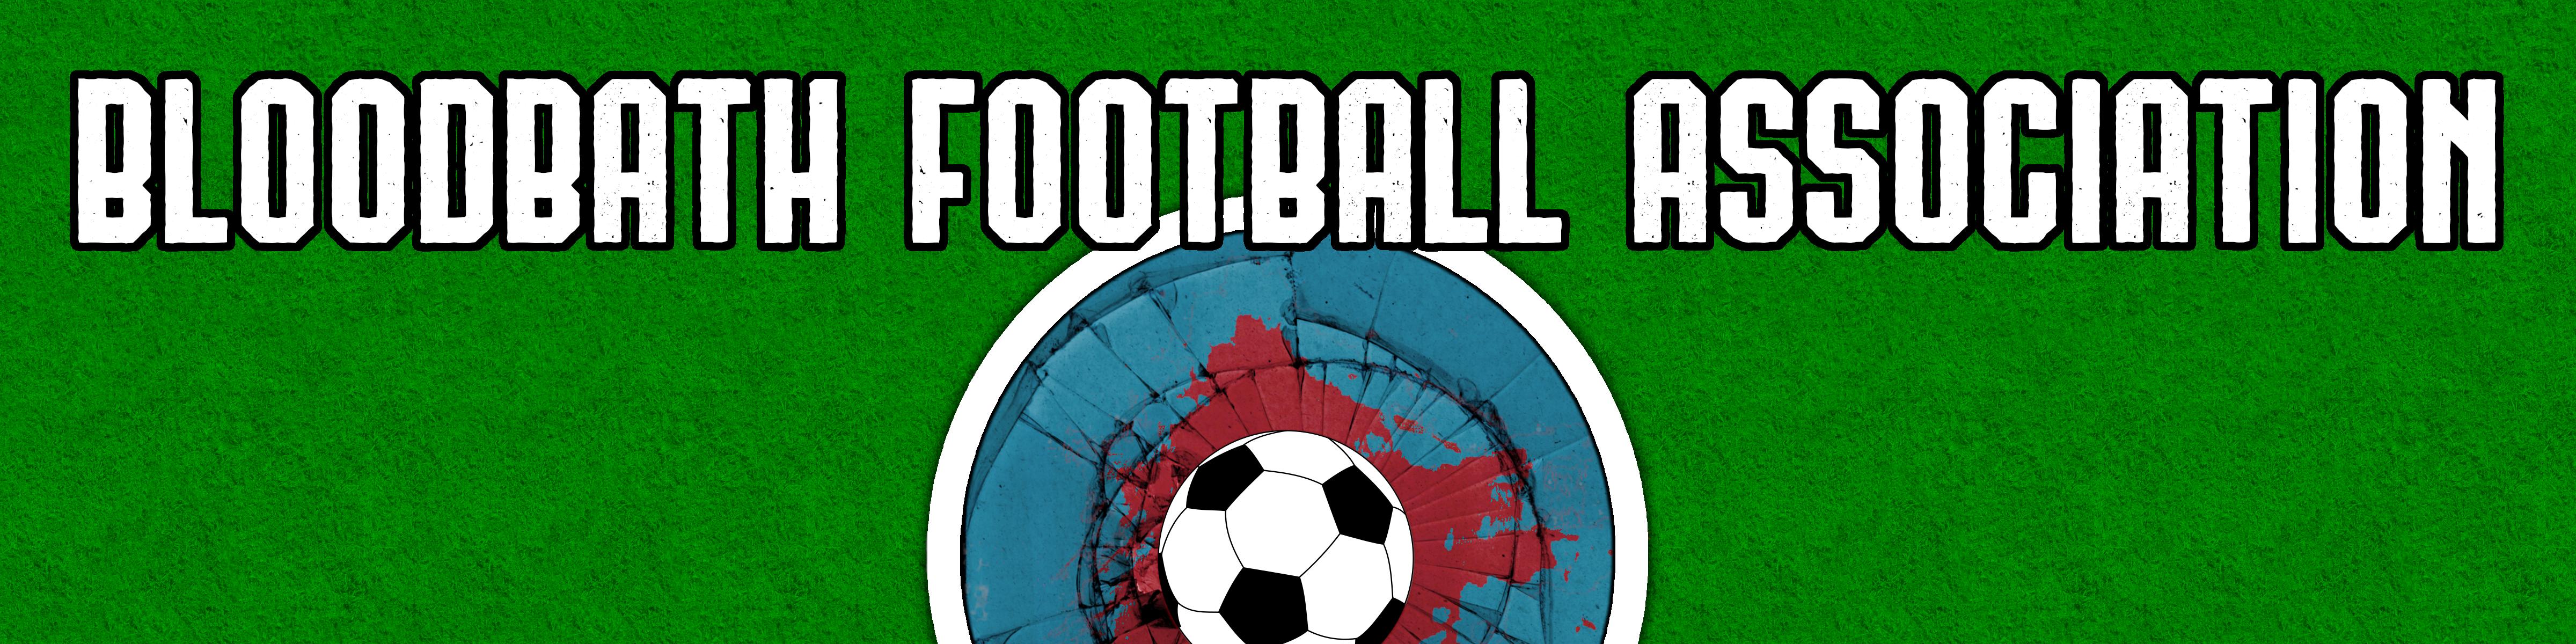 Bloodbath Football Association